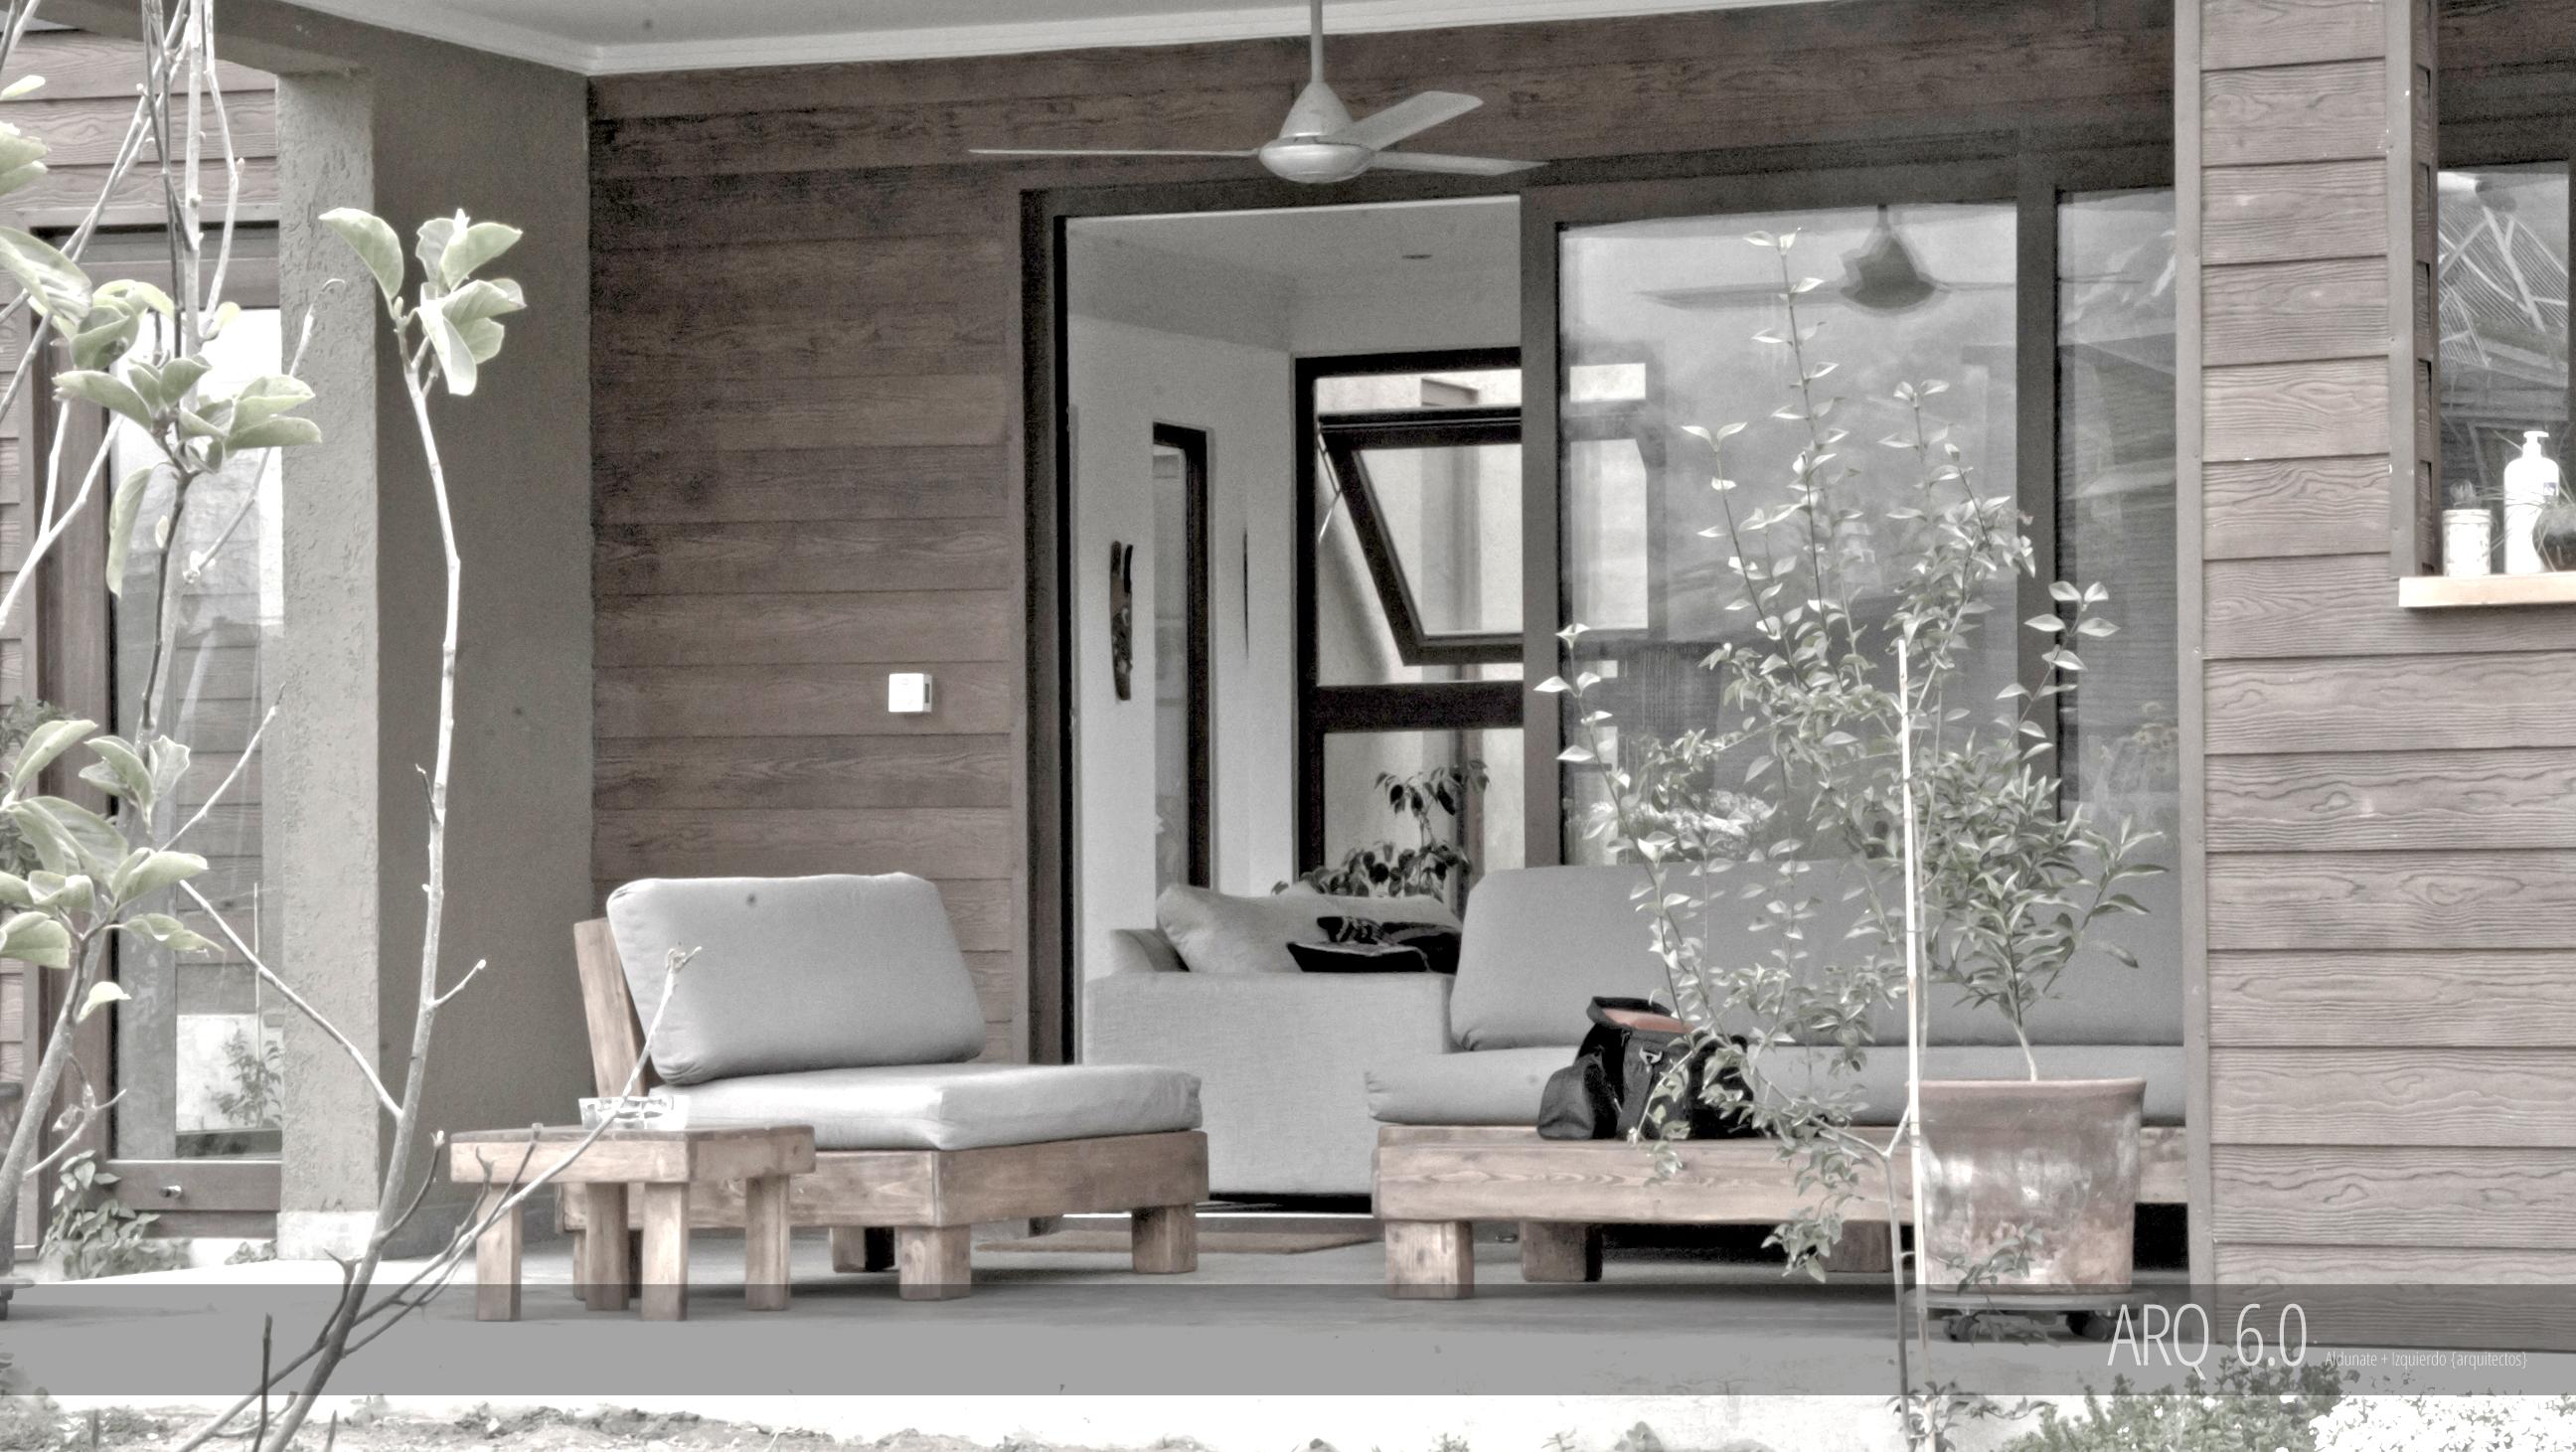 Arq6 - Casa Elzo Montero 02